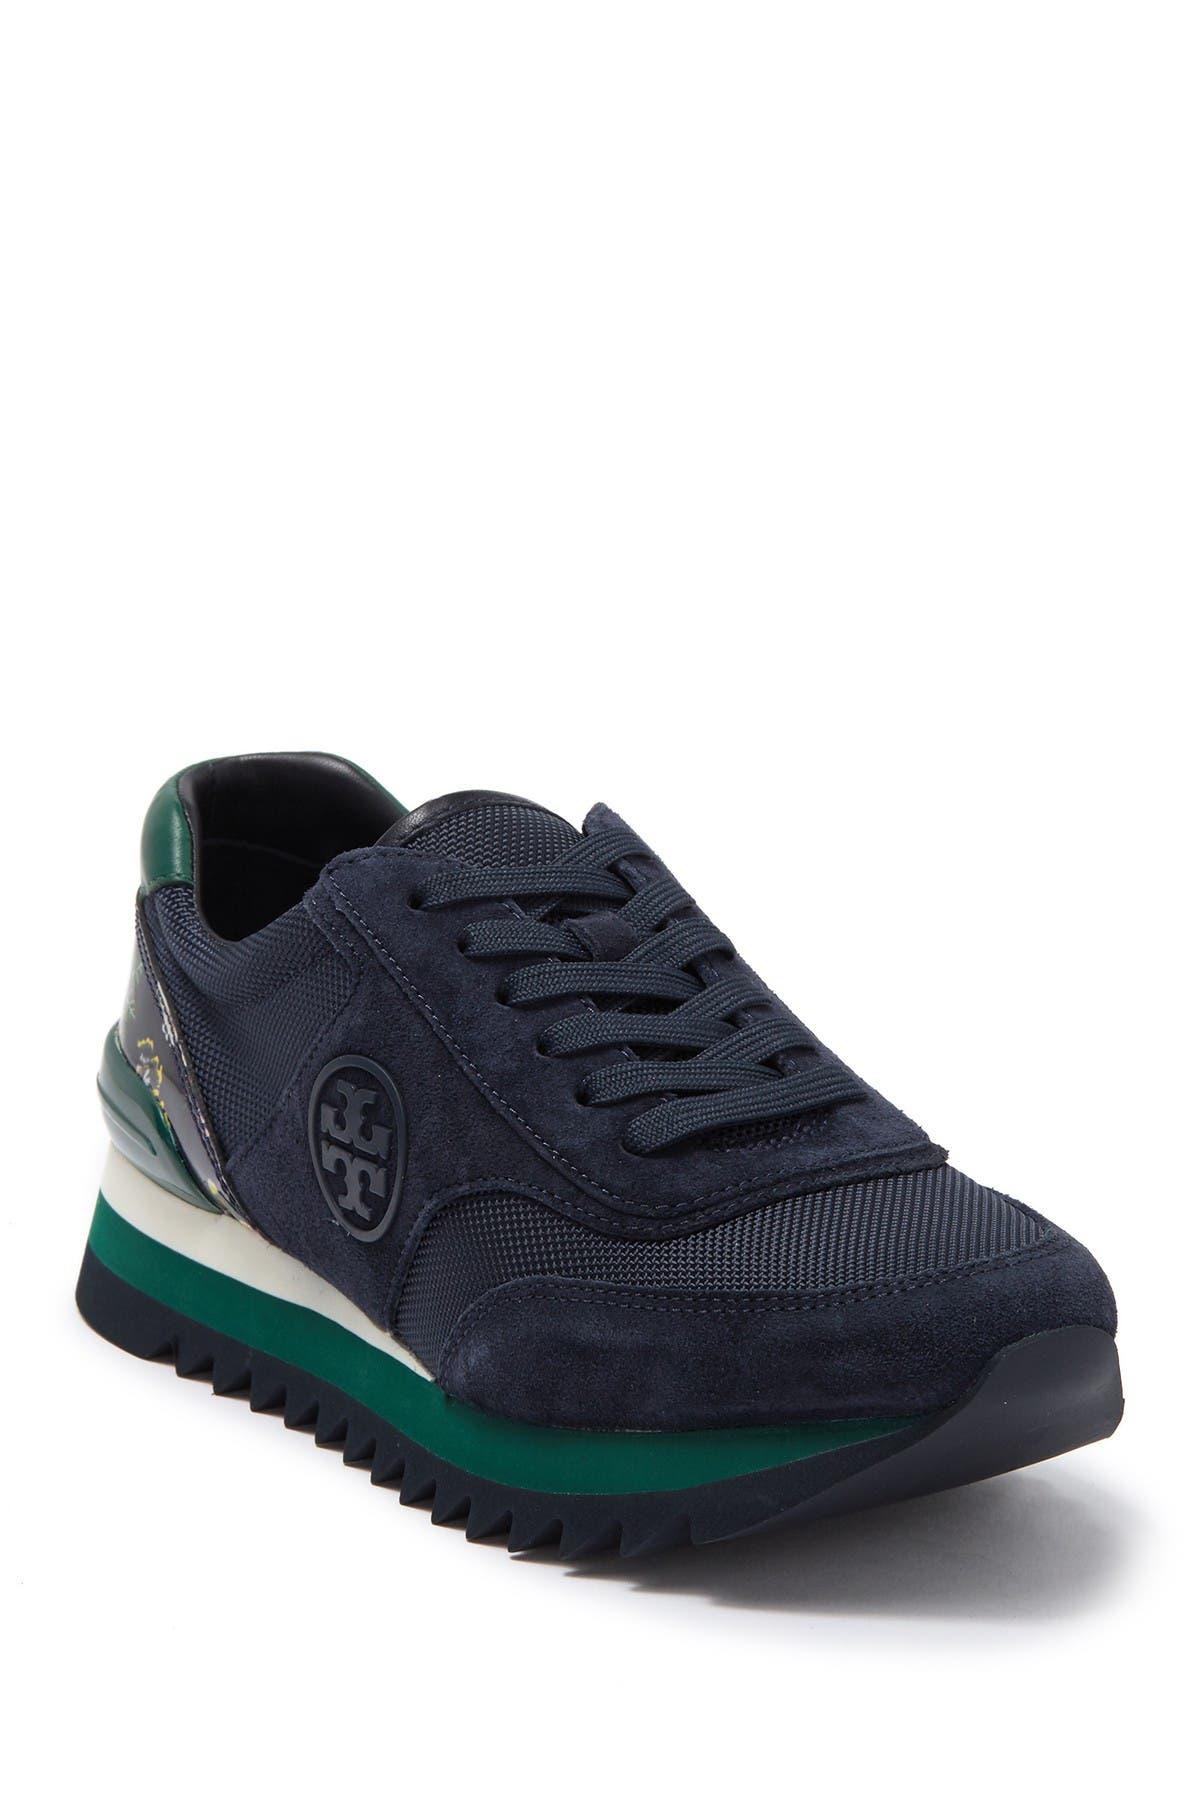 Tory Burch   Sawtooth Logo Sneaker